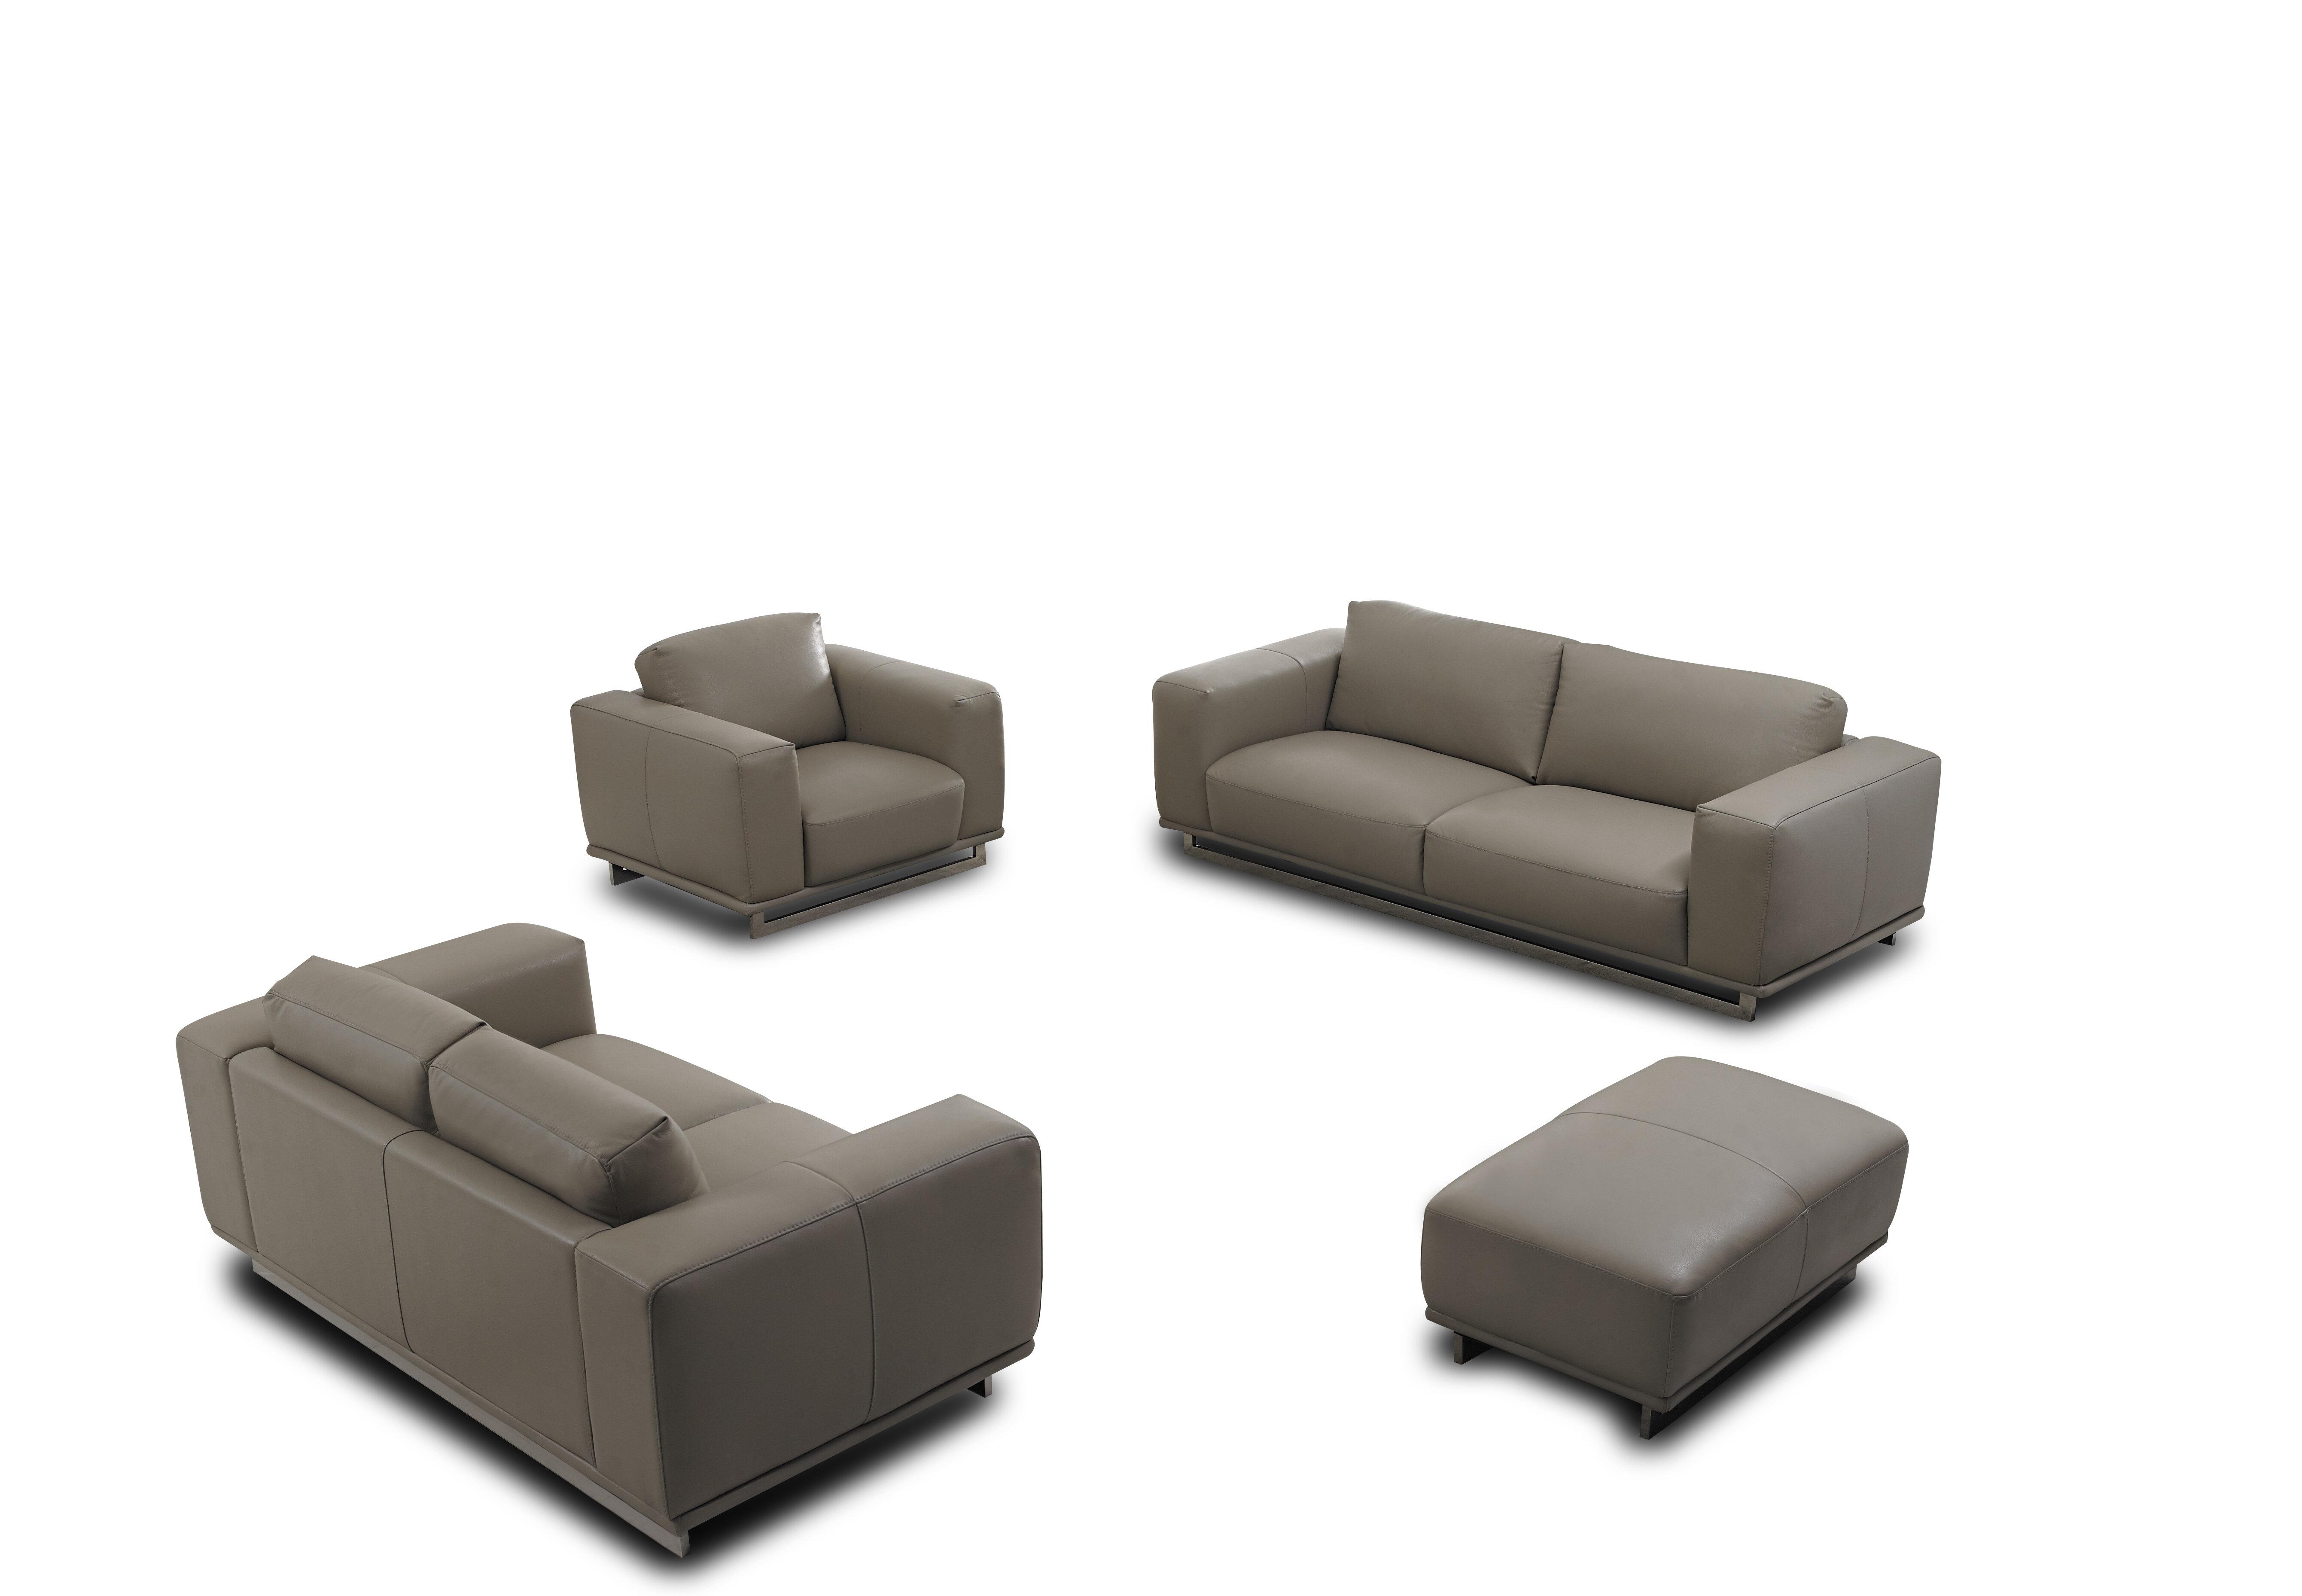 DavidDivaniDesigns 4 Piece Leather Living Room Set | Wayfair